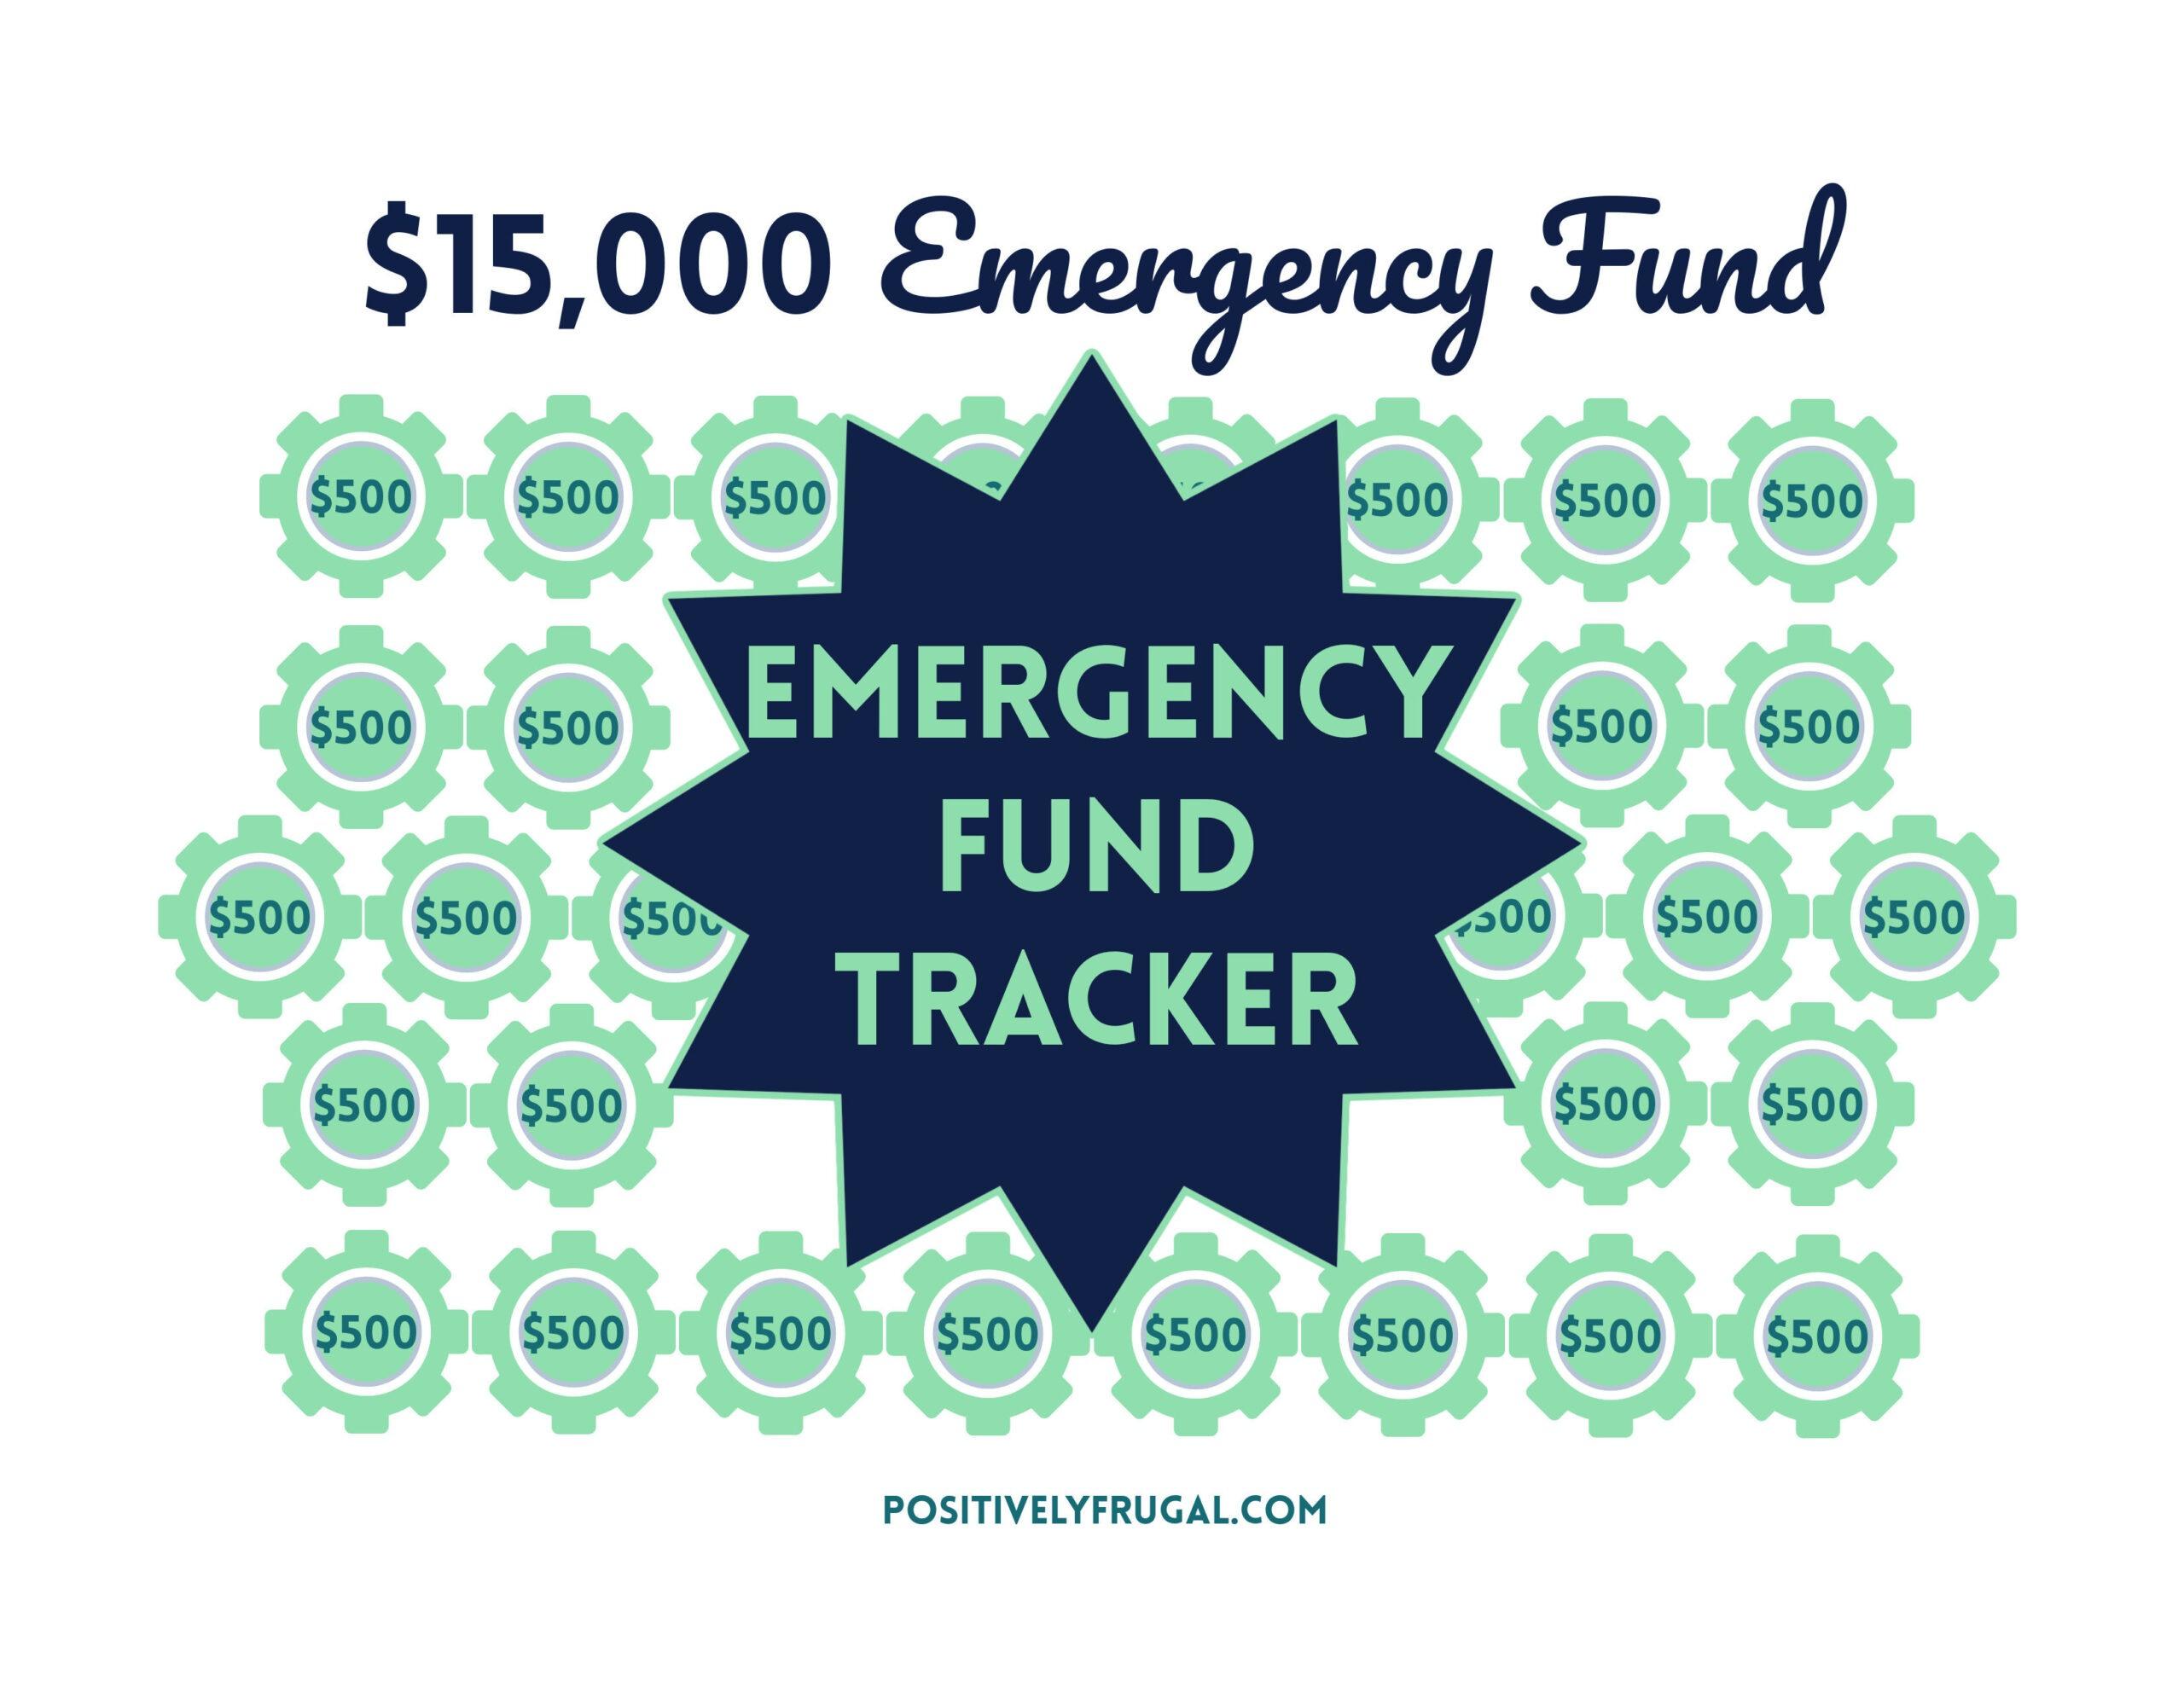 Emergency Fund Tracker by PositivelyFrugal.com